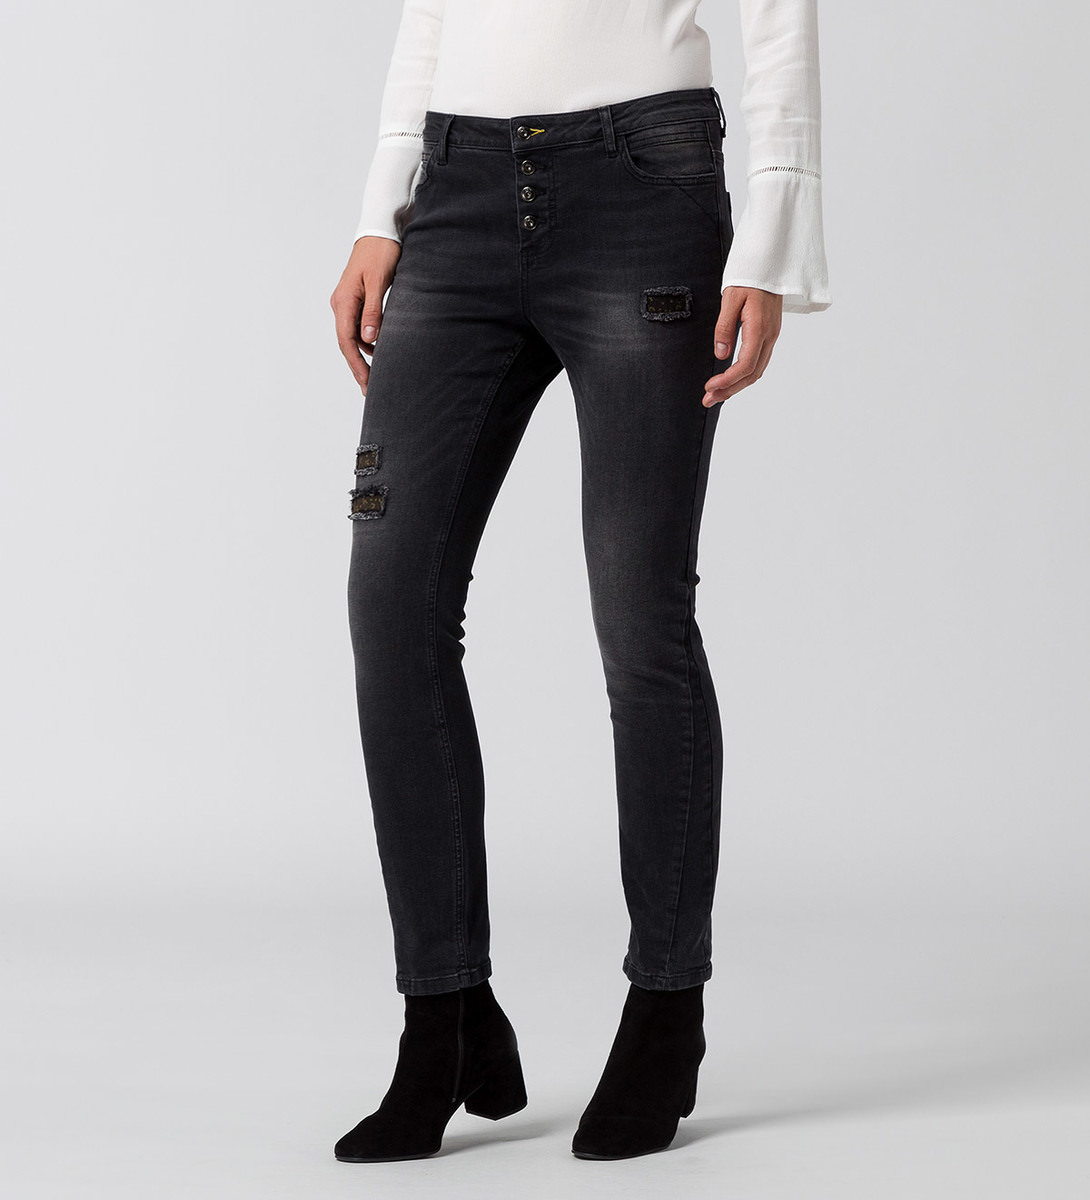 Jeans Georgia Style 30 inch grey denim destroyed wash